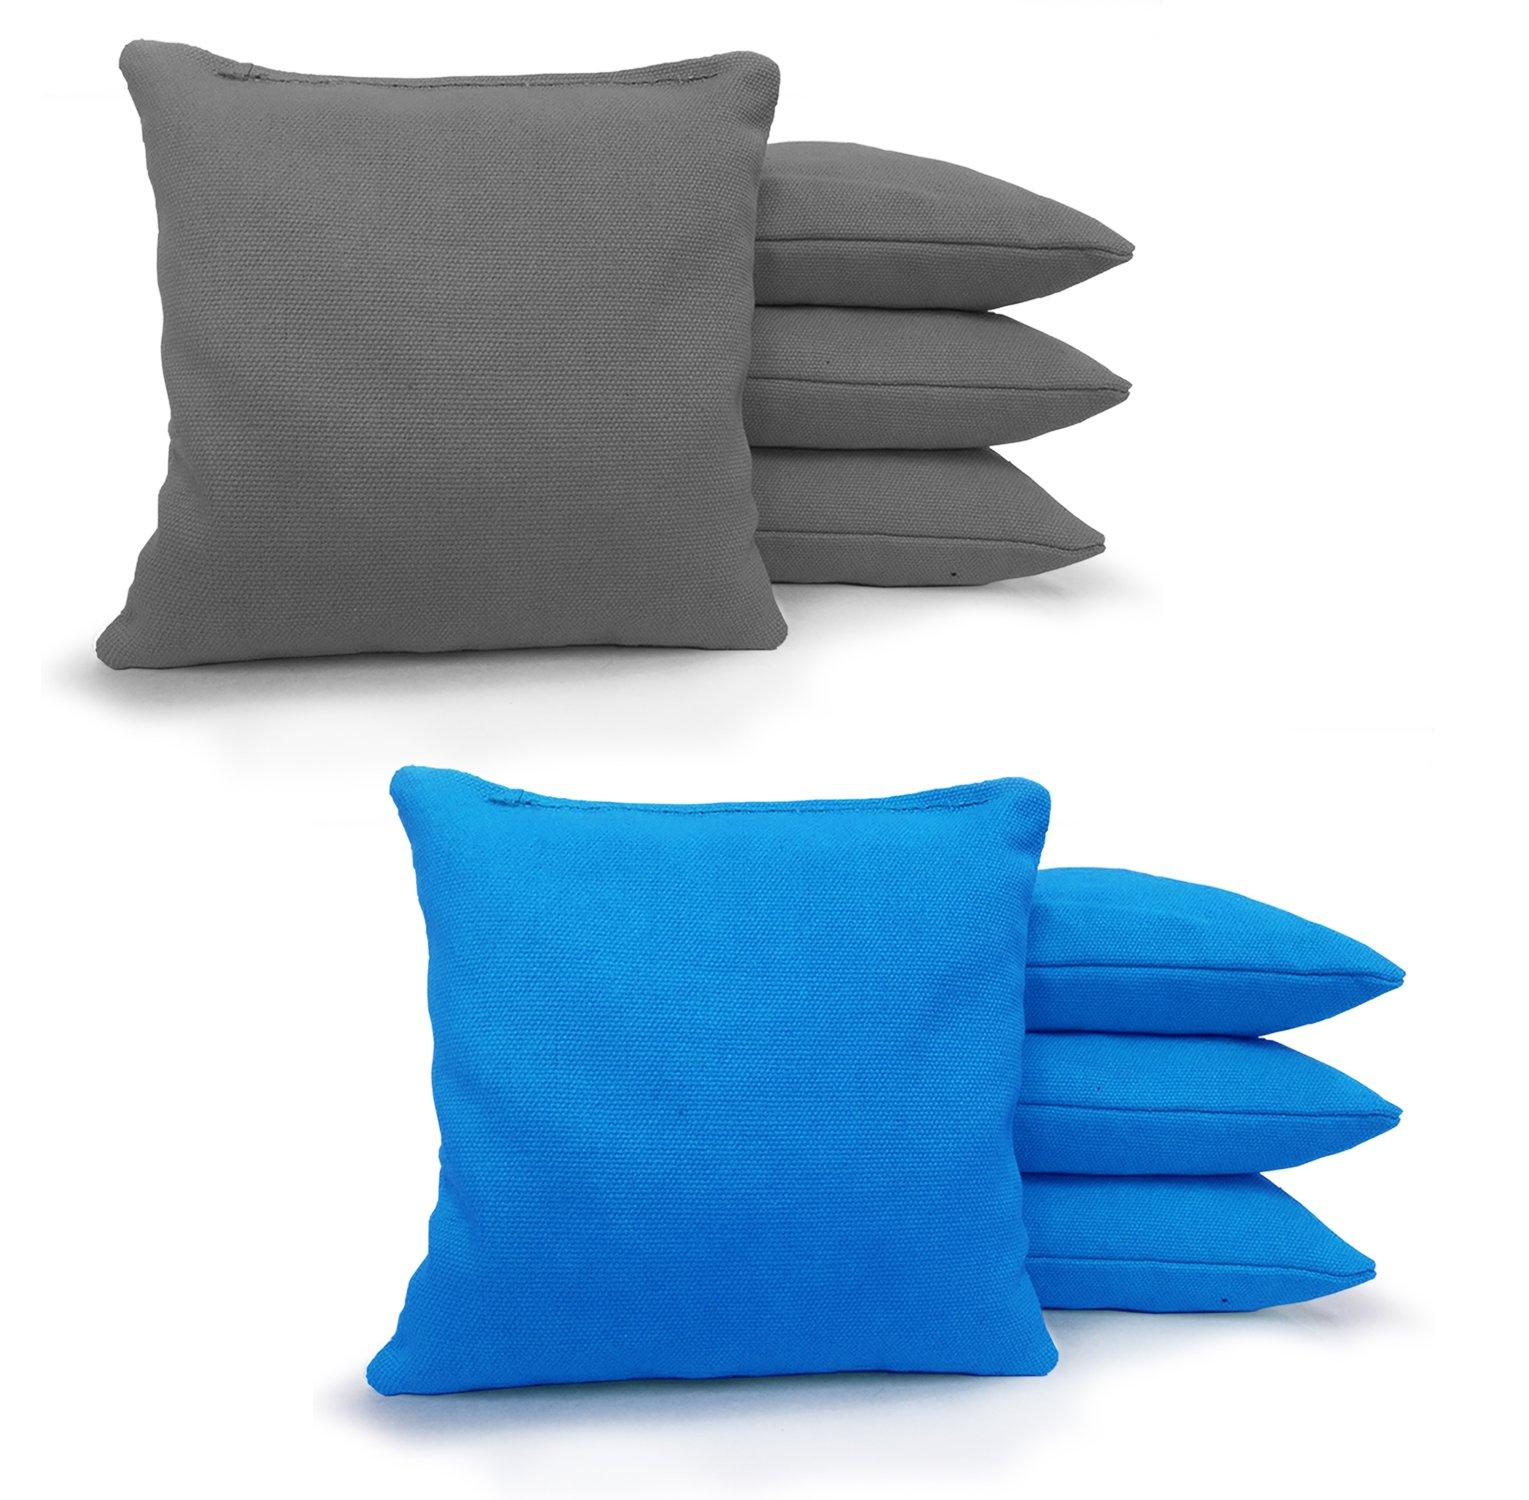 8 Standard Corn Filled Regulation 6''x6'' Duck Cloth Cornhole Bags! (Grey/Turquoise)